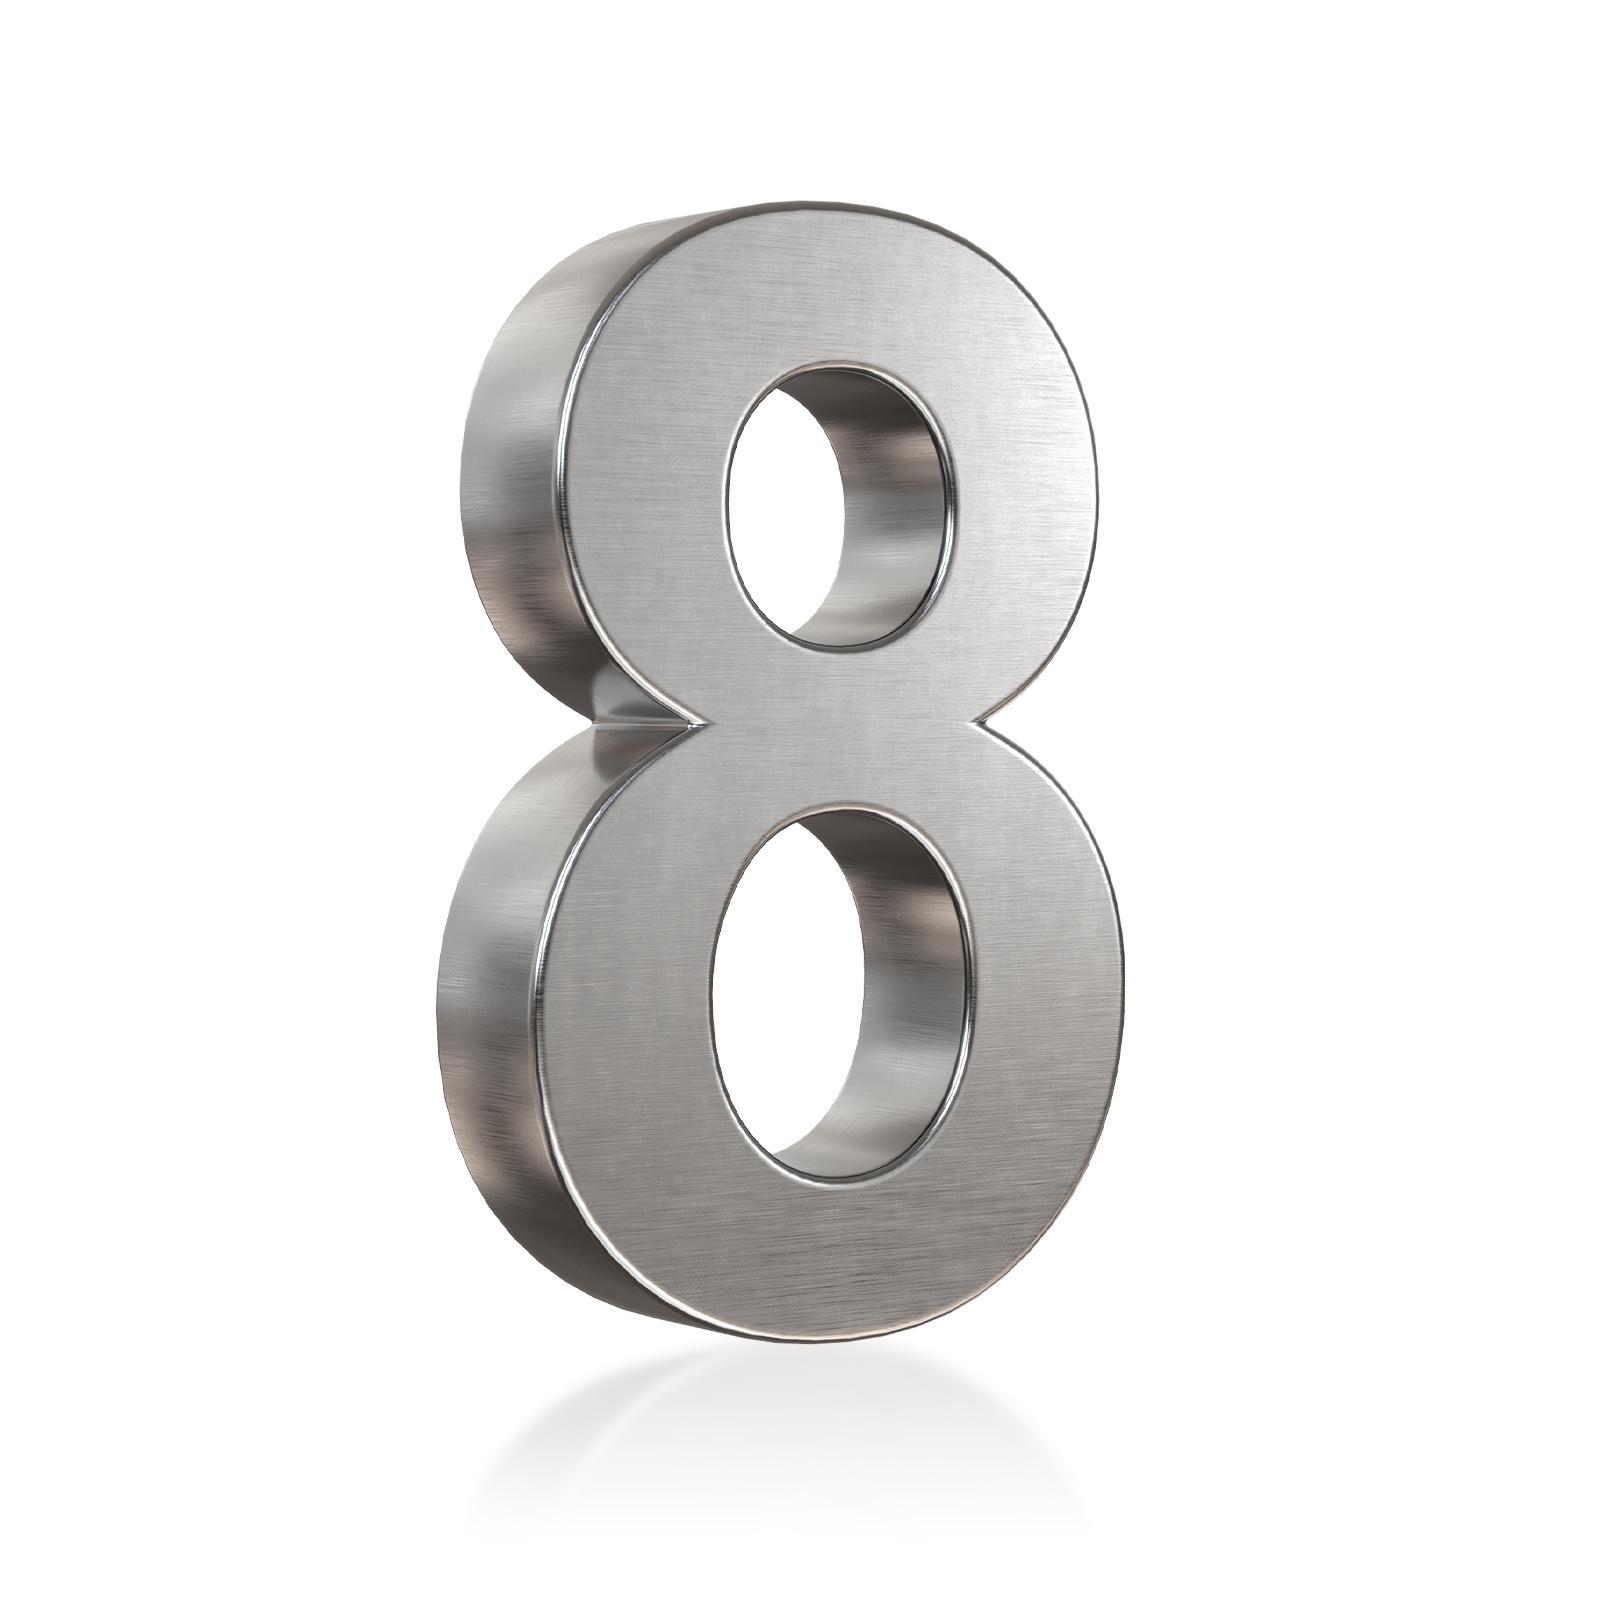 3D Hausnummer 8 Edelstahl in 3D Design Arial V2A